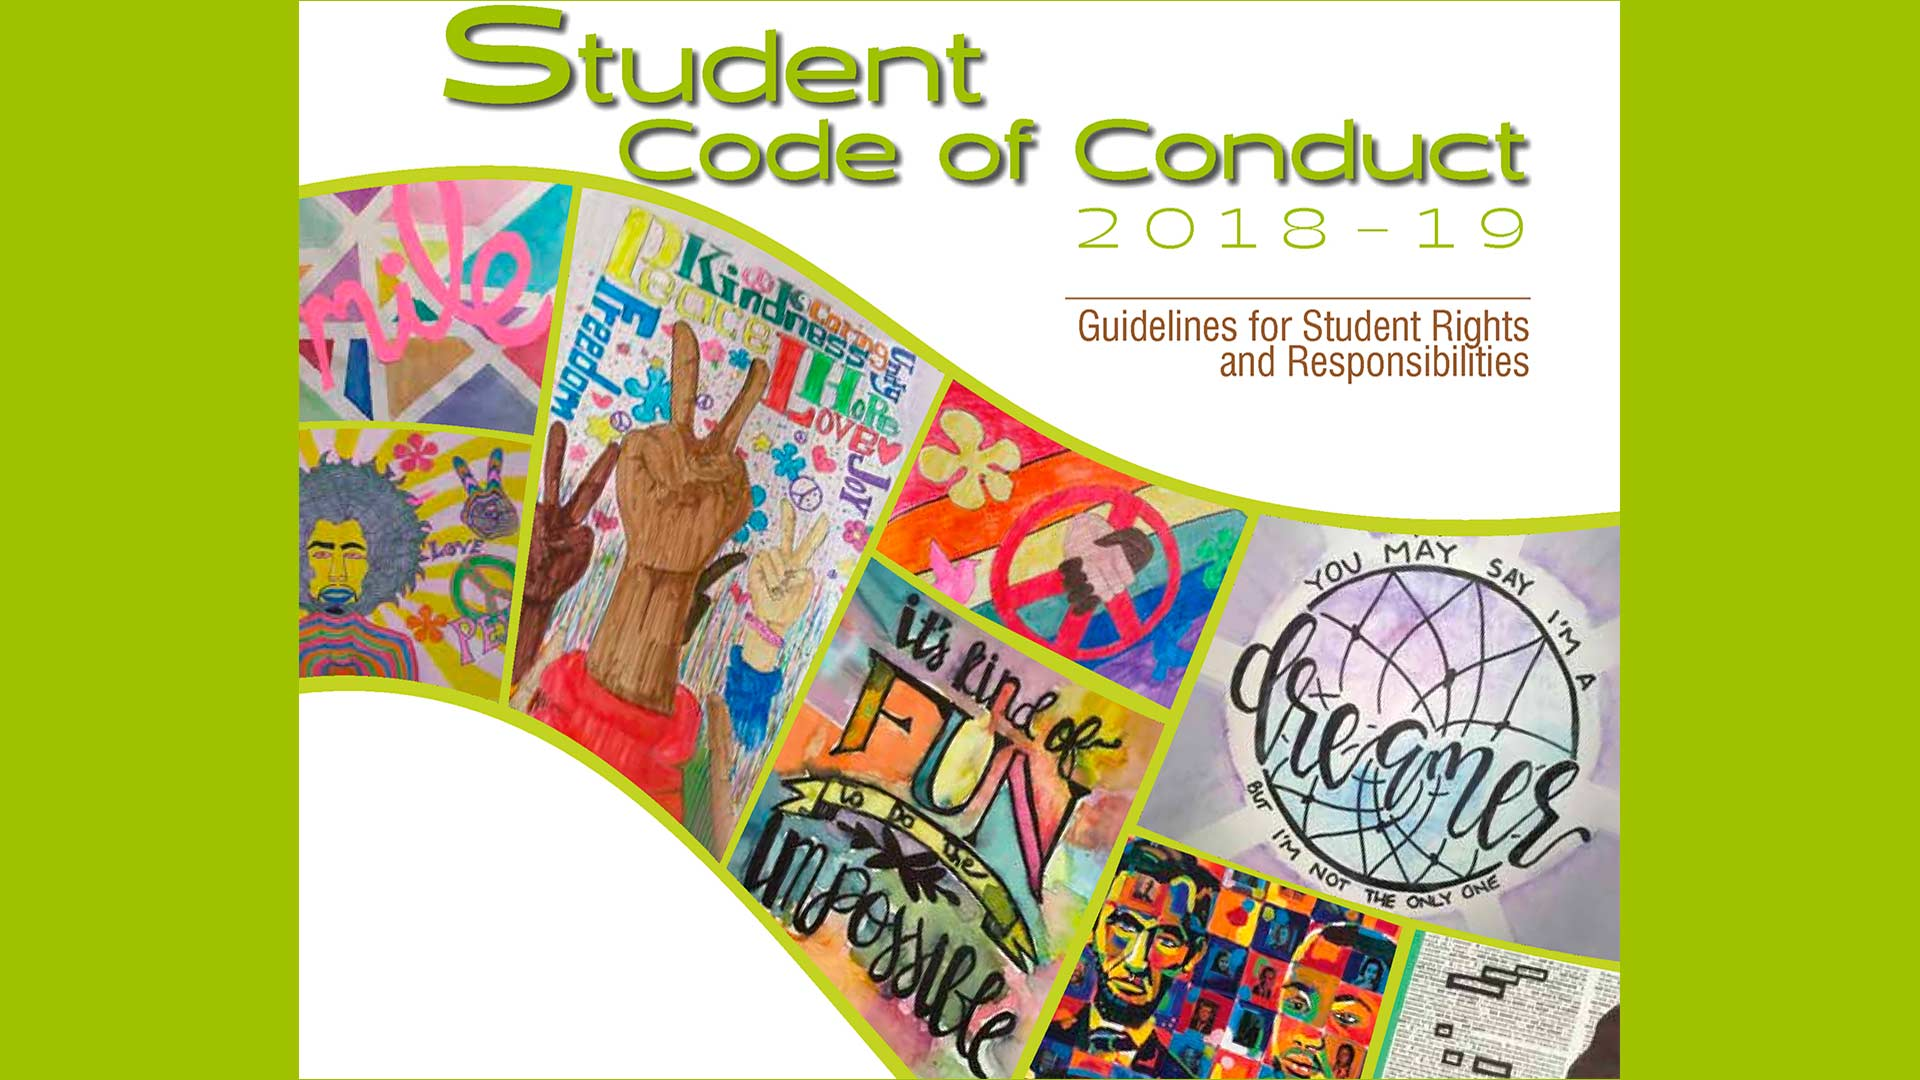 TUSD Code of Conduct